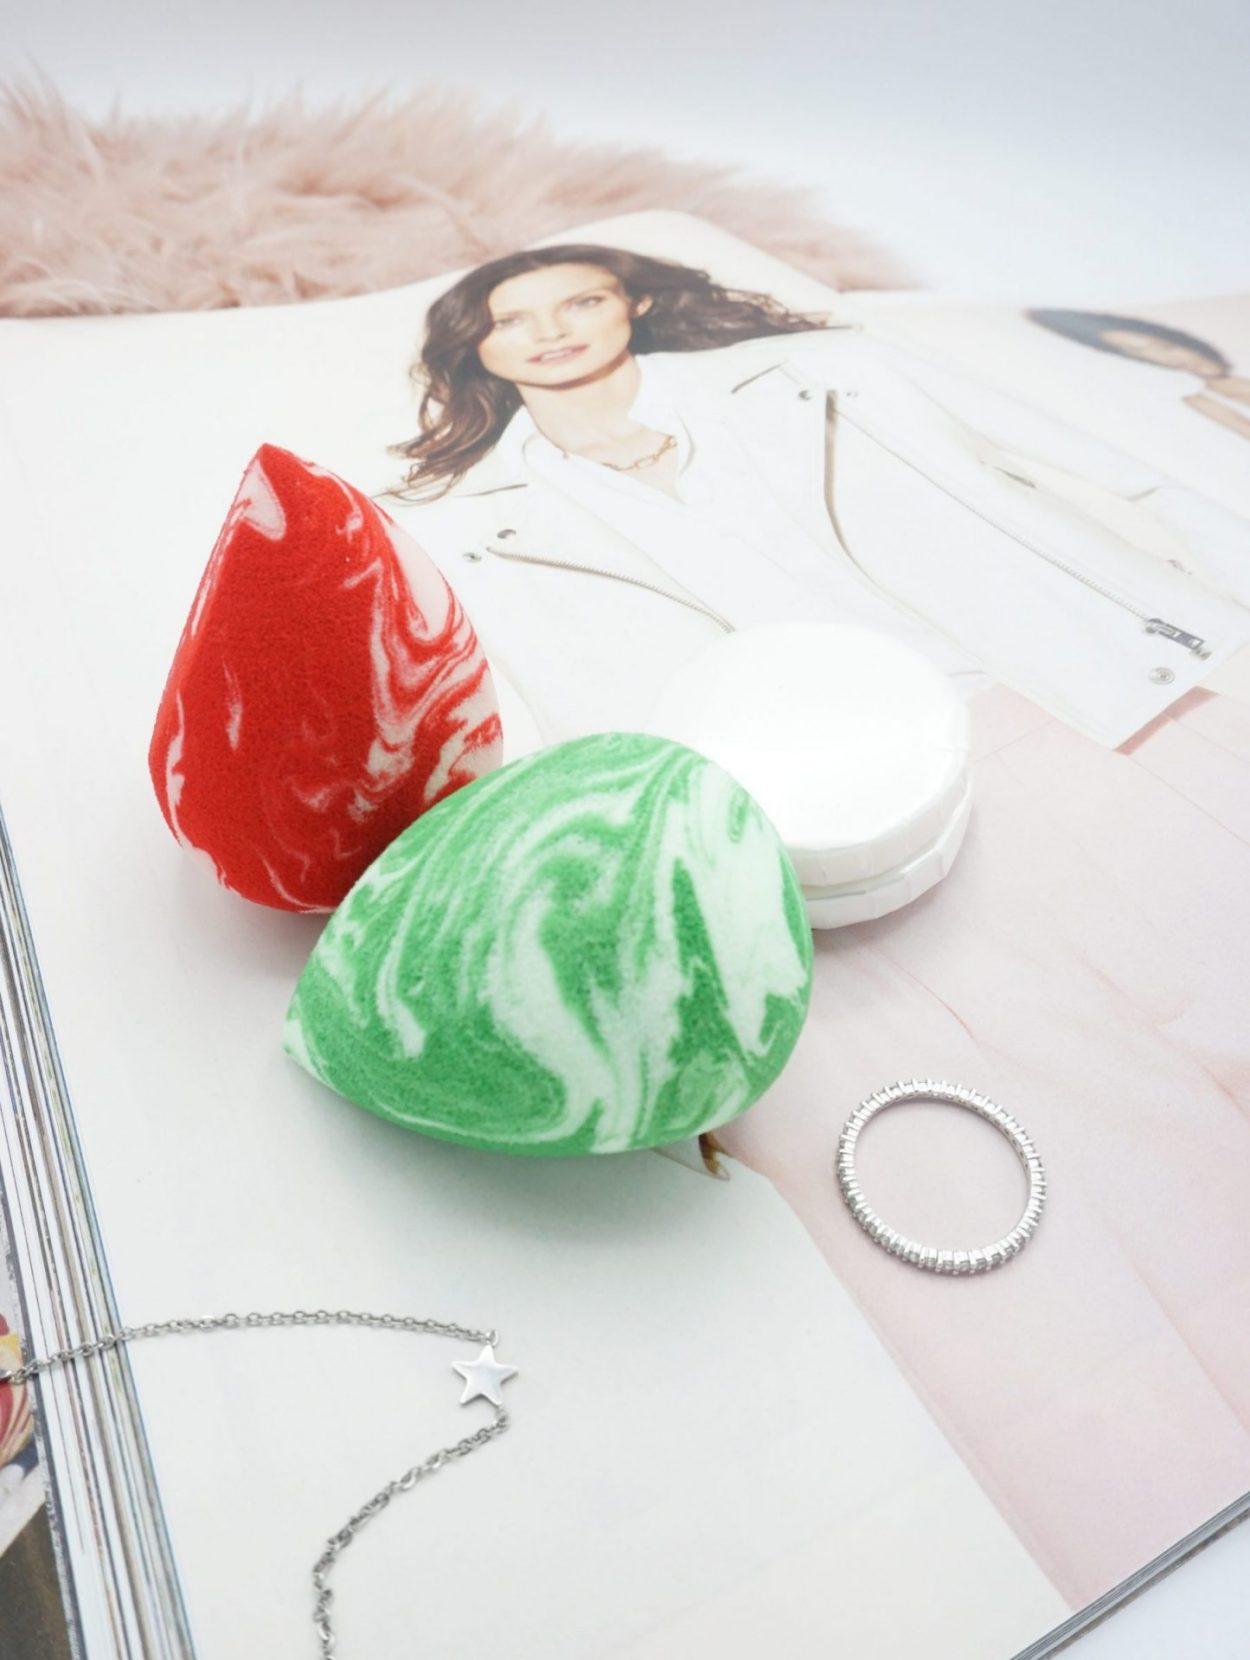 2 Coloured Raine Candy Cane Raine Sponges and Sponge Cleansers ⋆ Beautymone